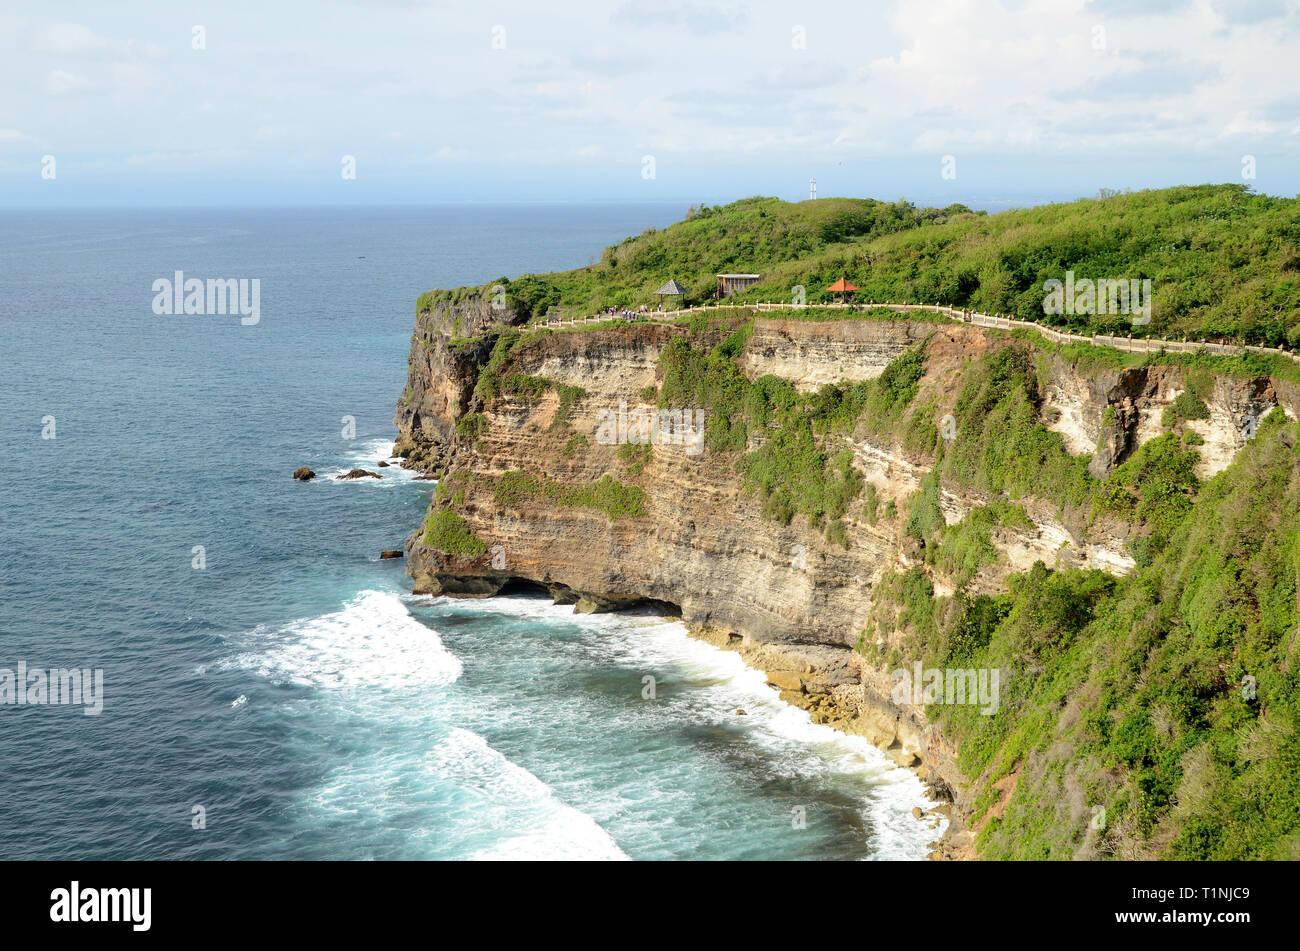 Pura Luhur Uluwatu temple in Bali, Indonesia with cliff with blue sky and sea Stock Photo